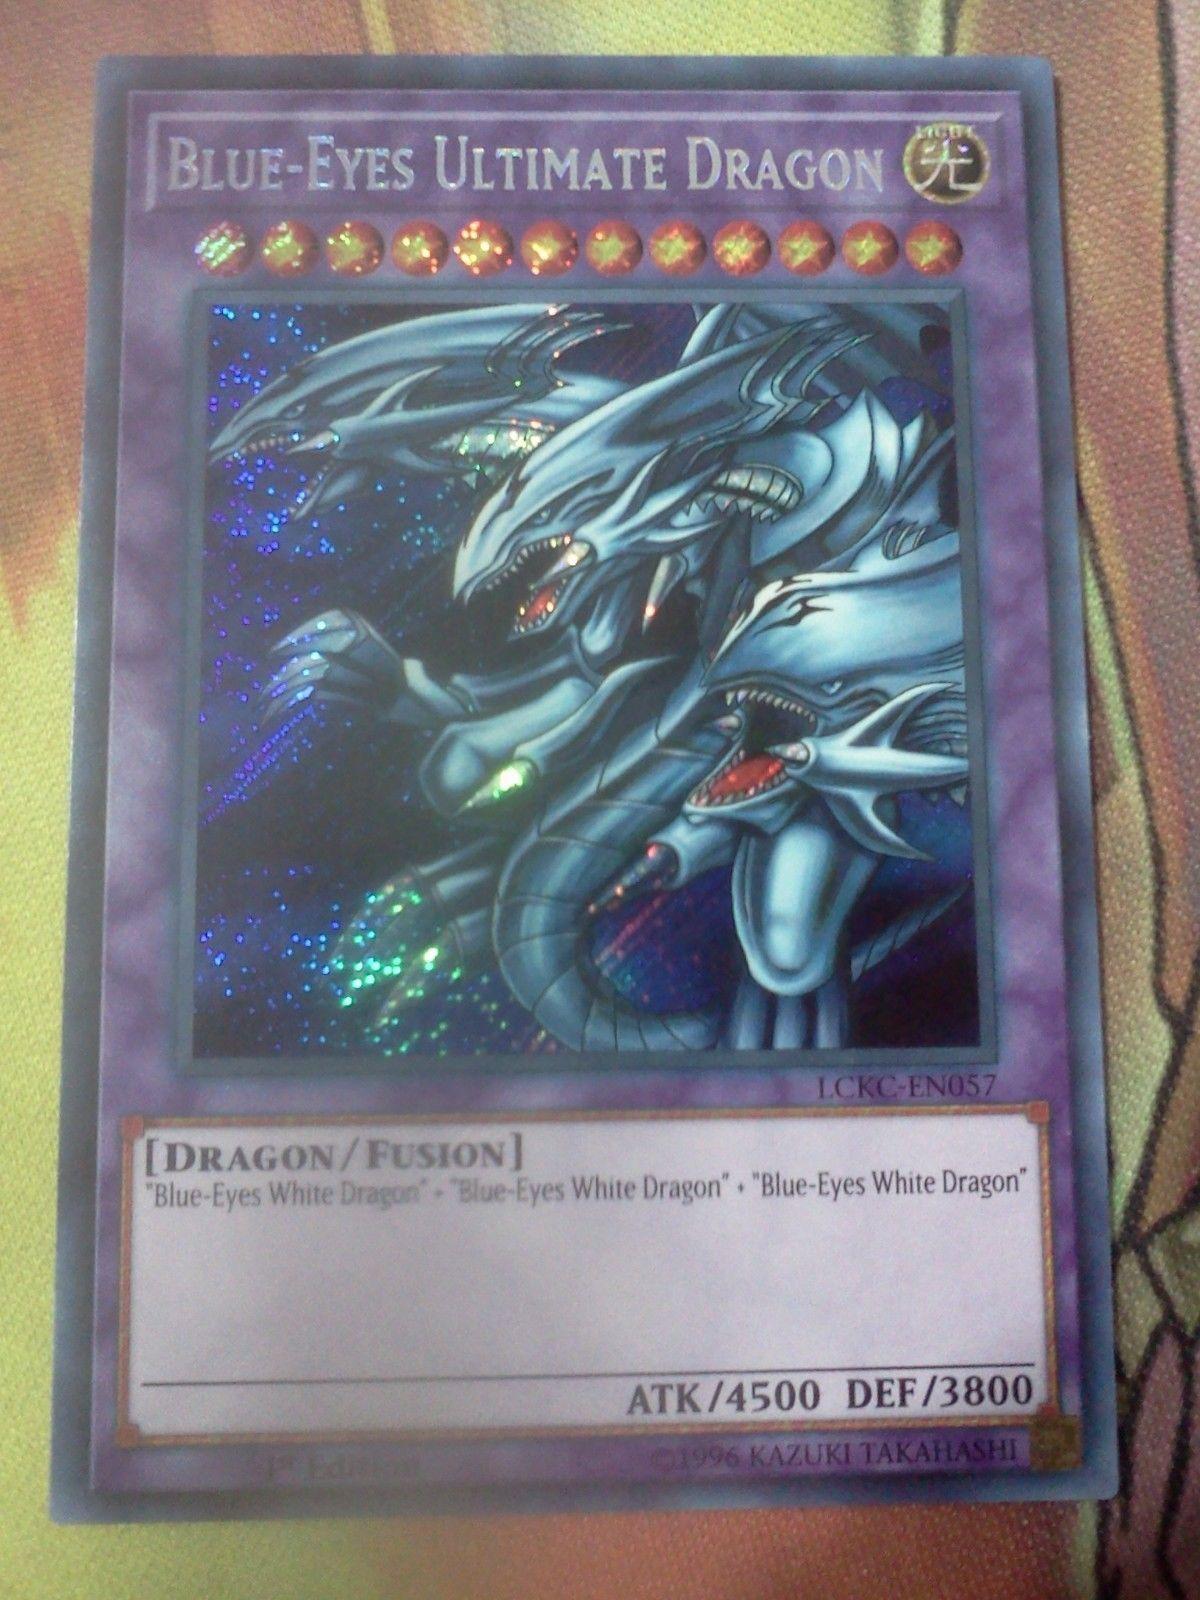 Yugioh Blue-Eyes Ultimate Dragon LCKC-EN057 1st Edition Secret Rare Near Mint